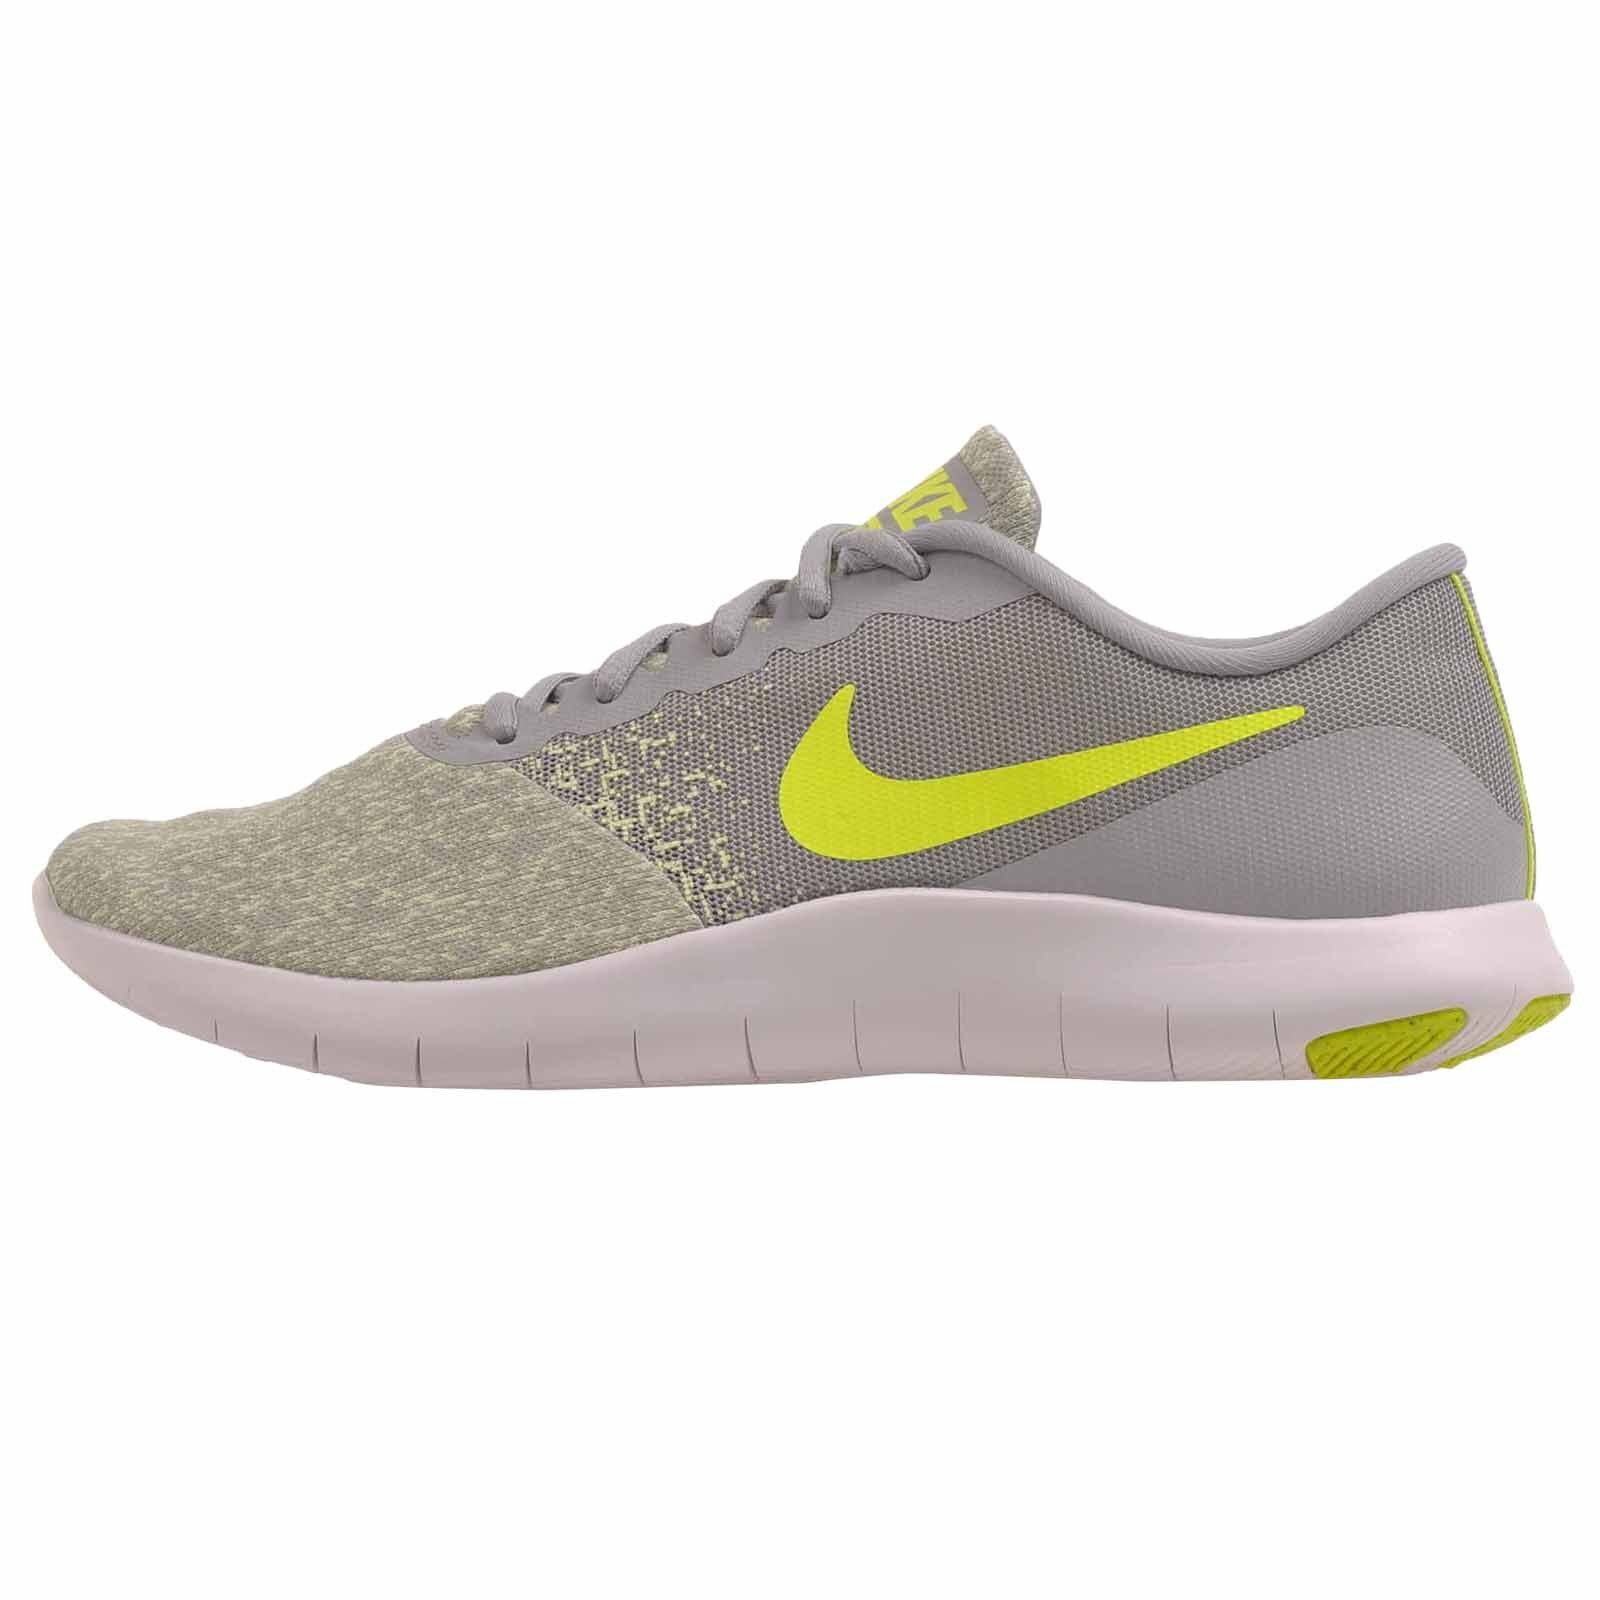 NIKE Women's Flex Contact Running Shoe Wolf Grey/Volt-barely Volt 8.5 BPrice reduction US